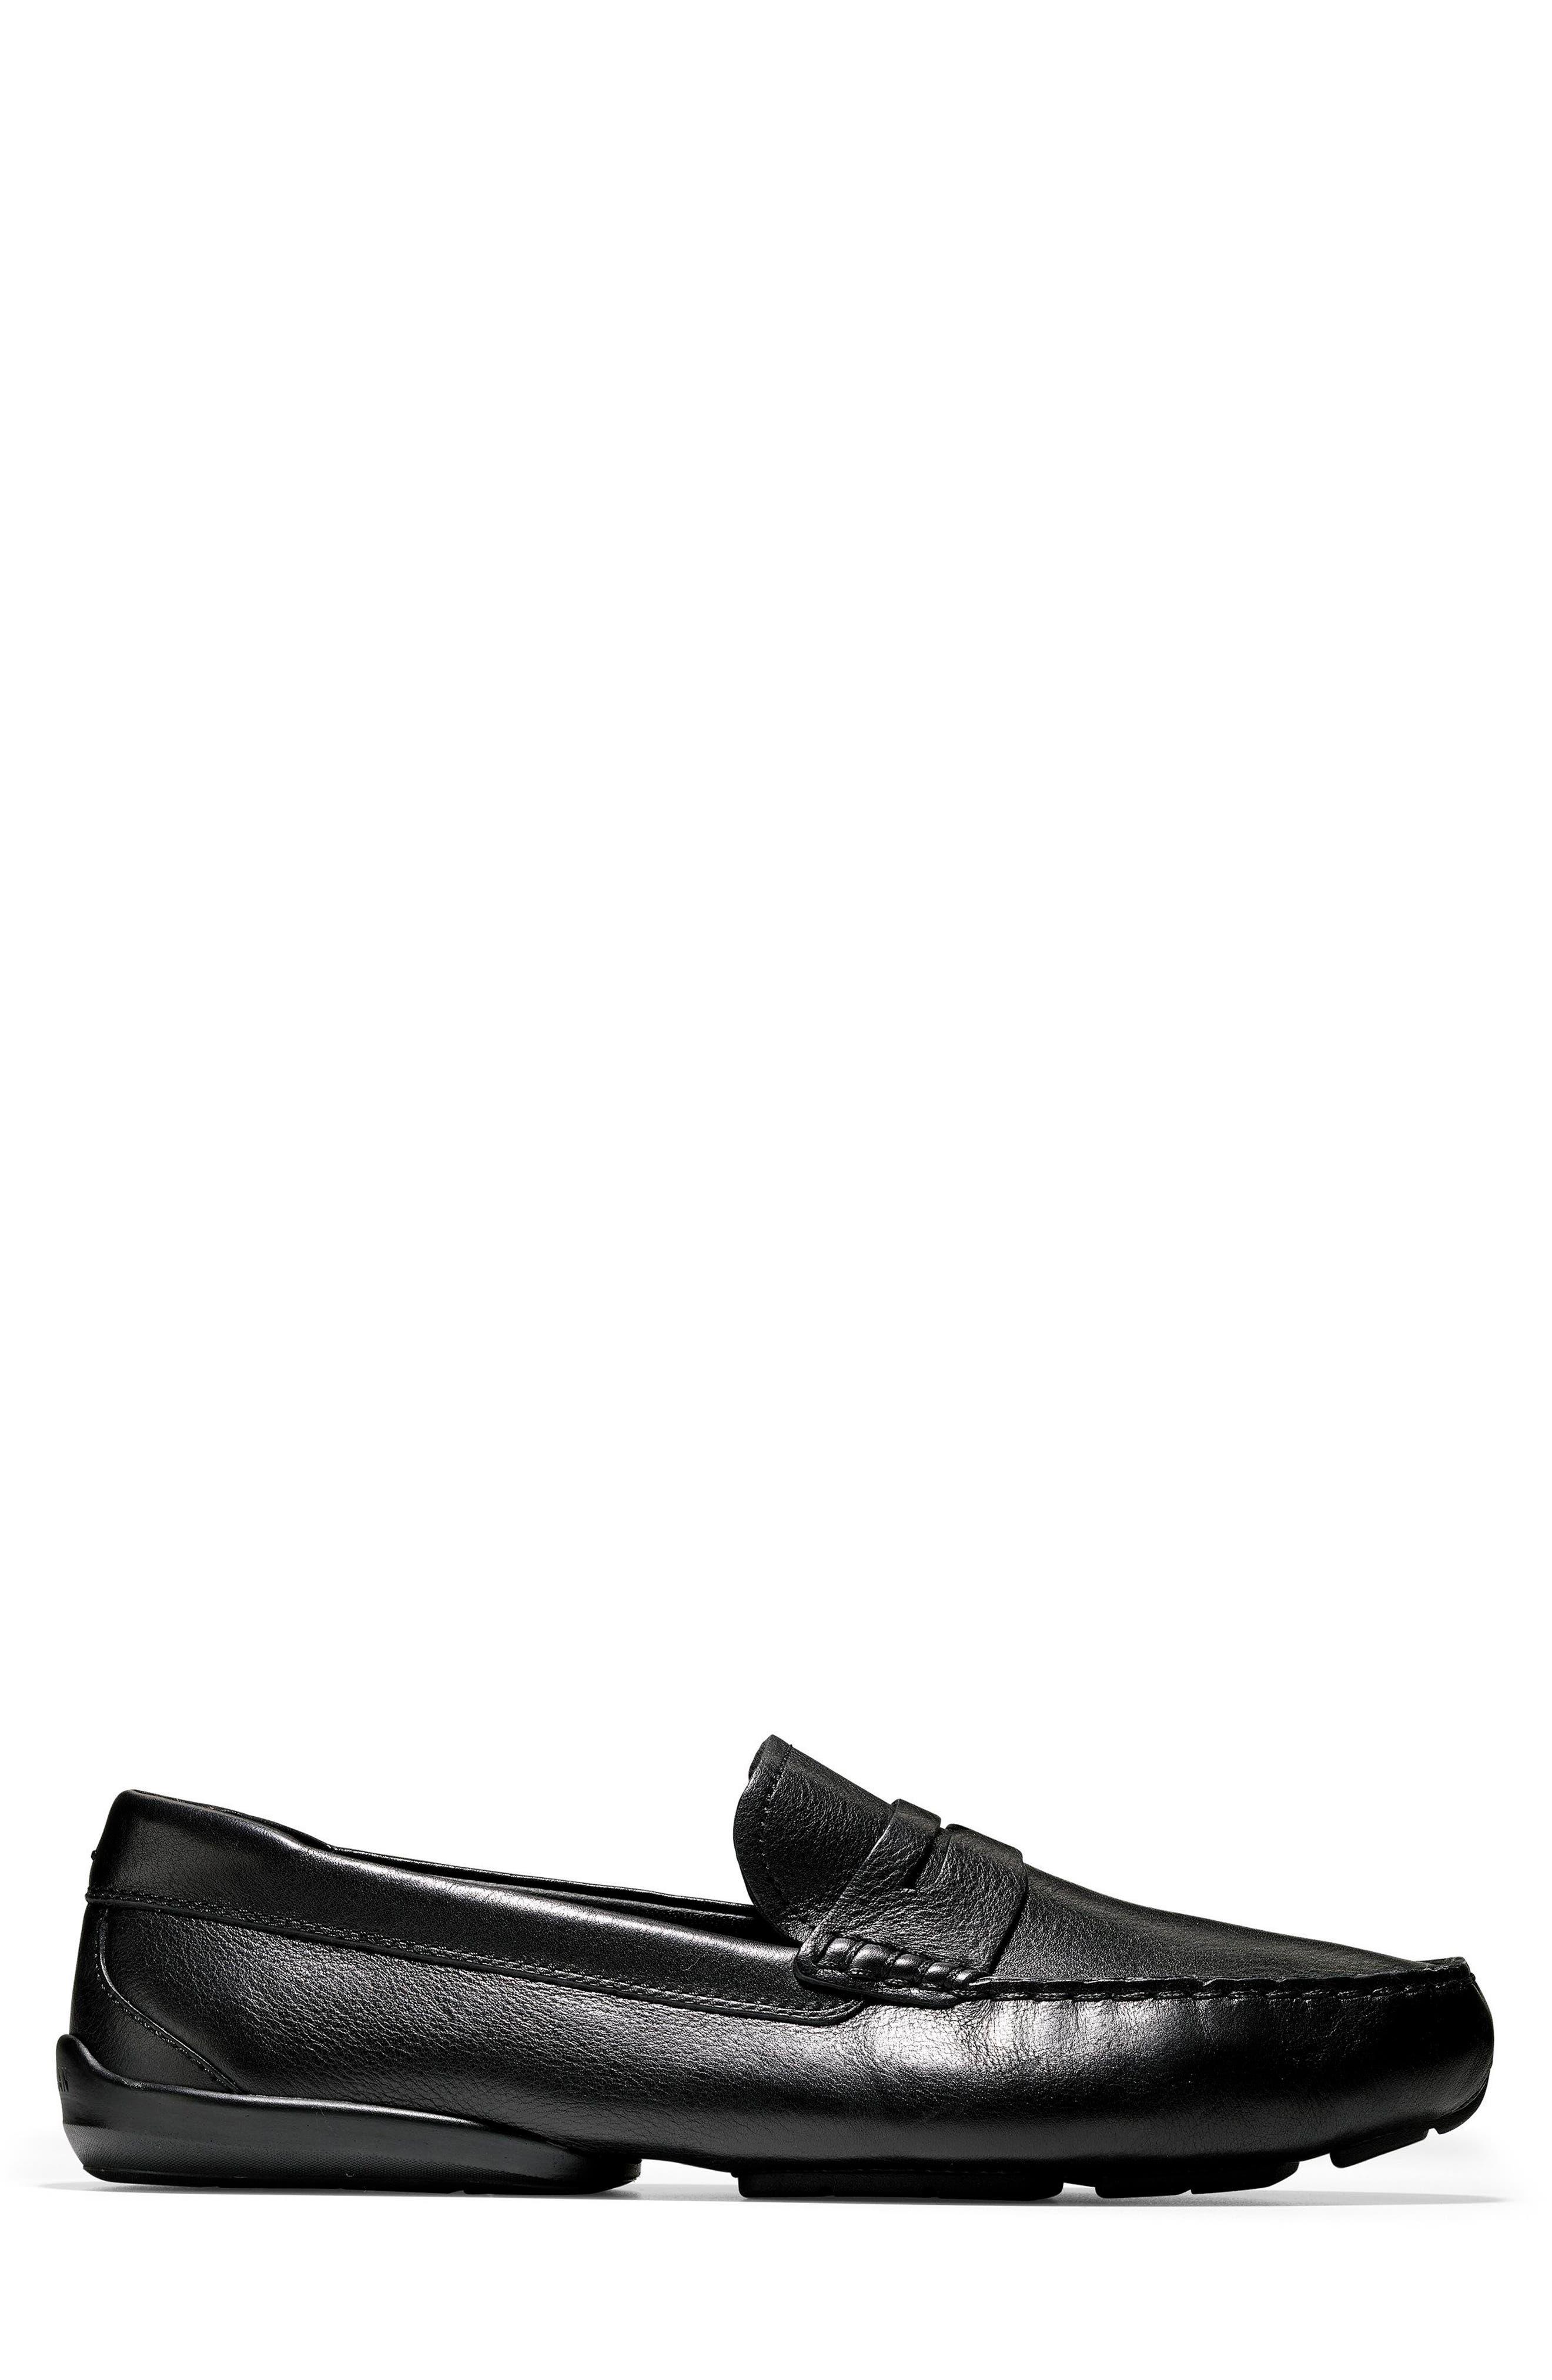 Branson Penny Driver,                             Alternate thumbnail 4, color,                             Black Leather